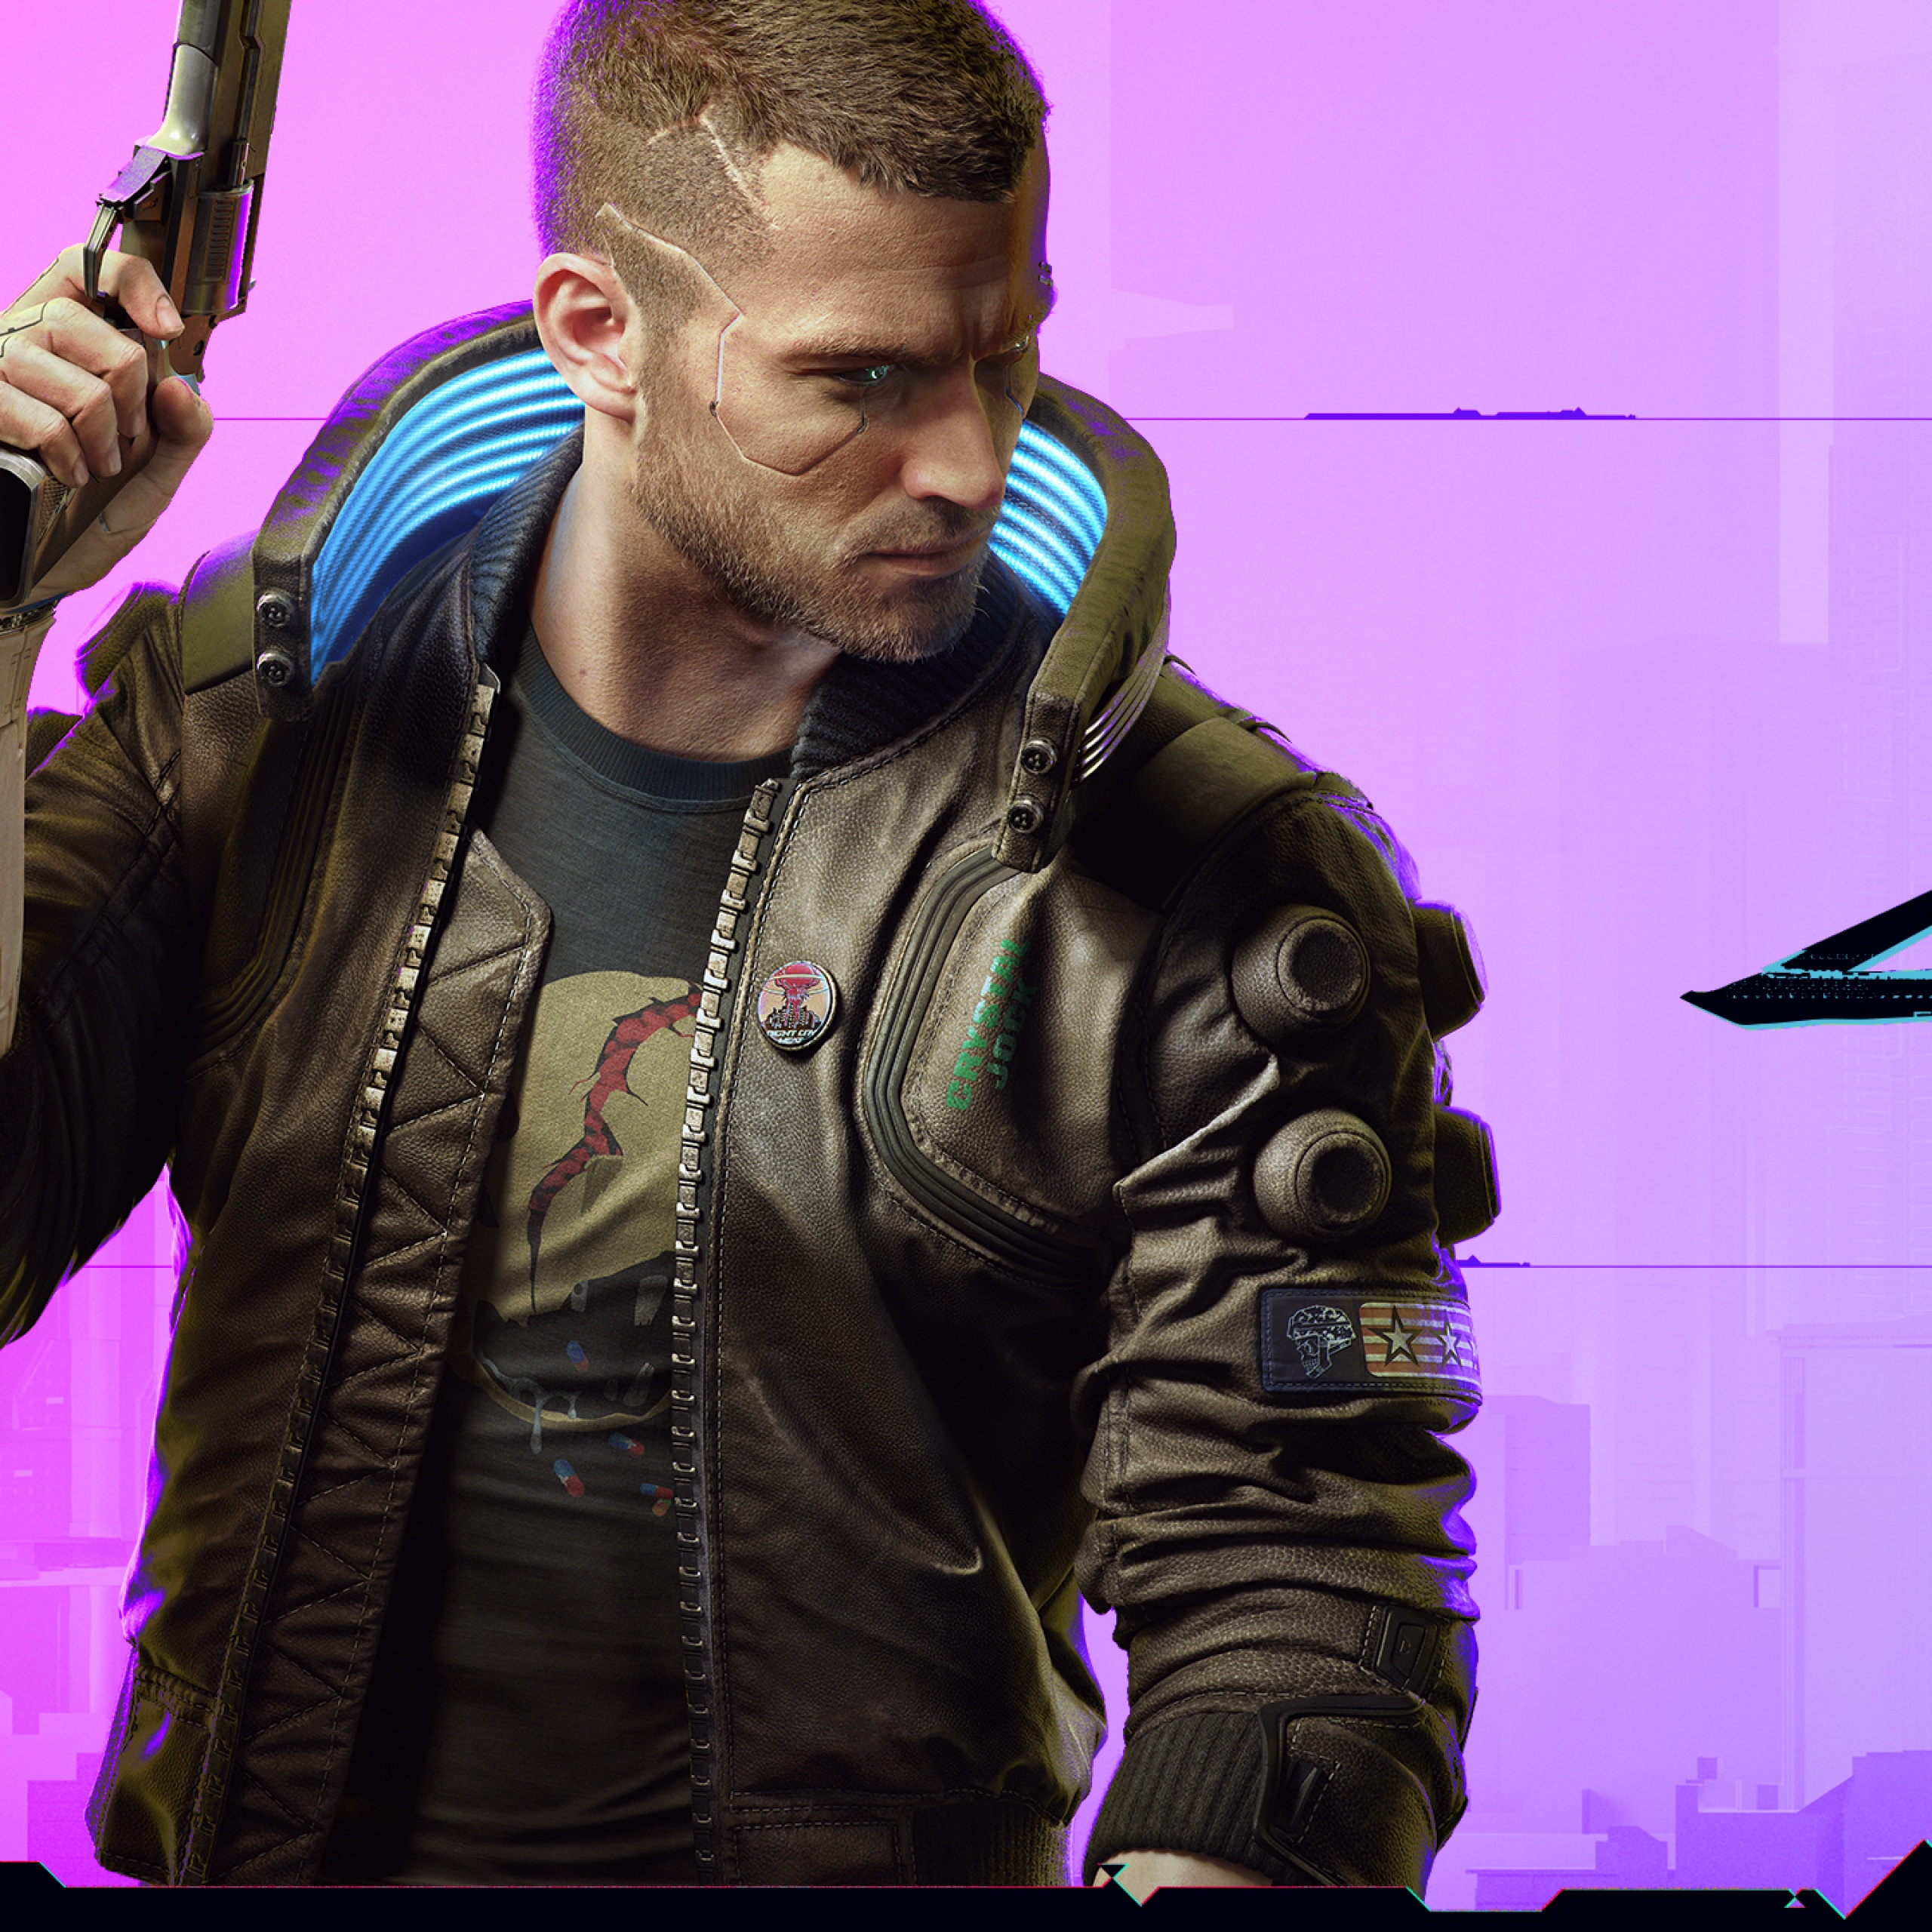 Cyberpunk 2077 4K Wallpaper, Character V, Xbox Series X ...